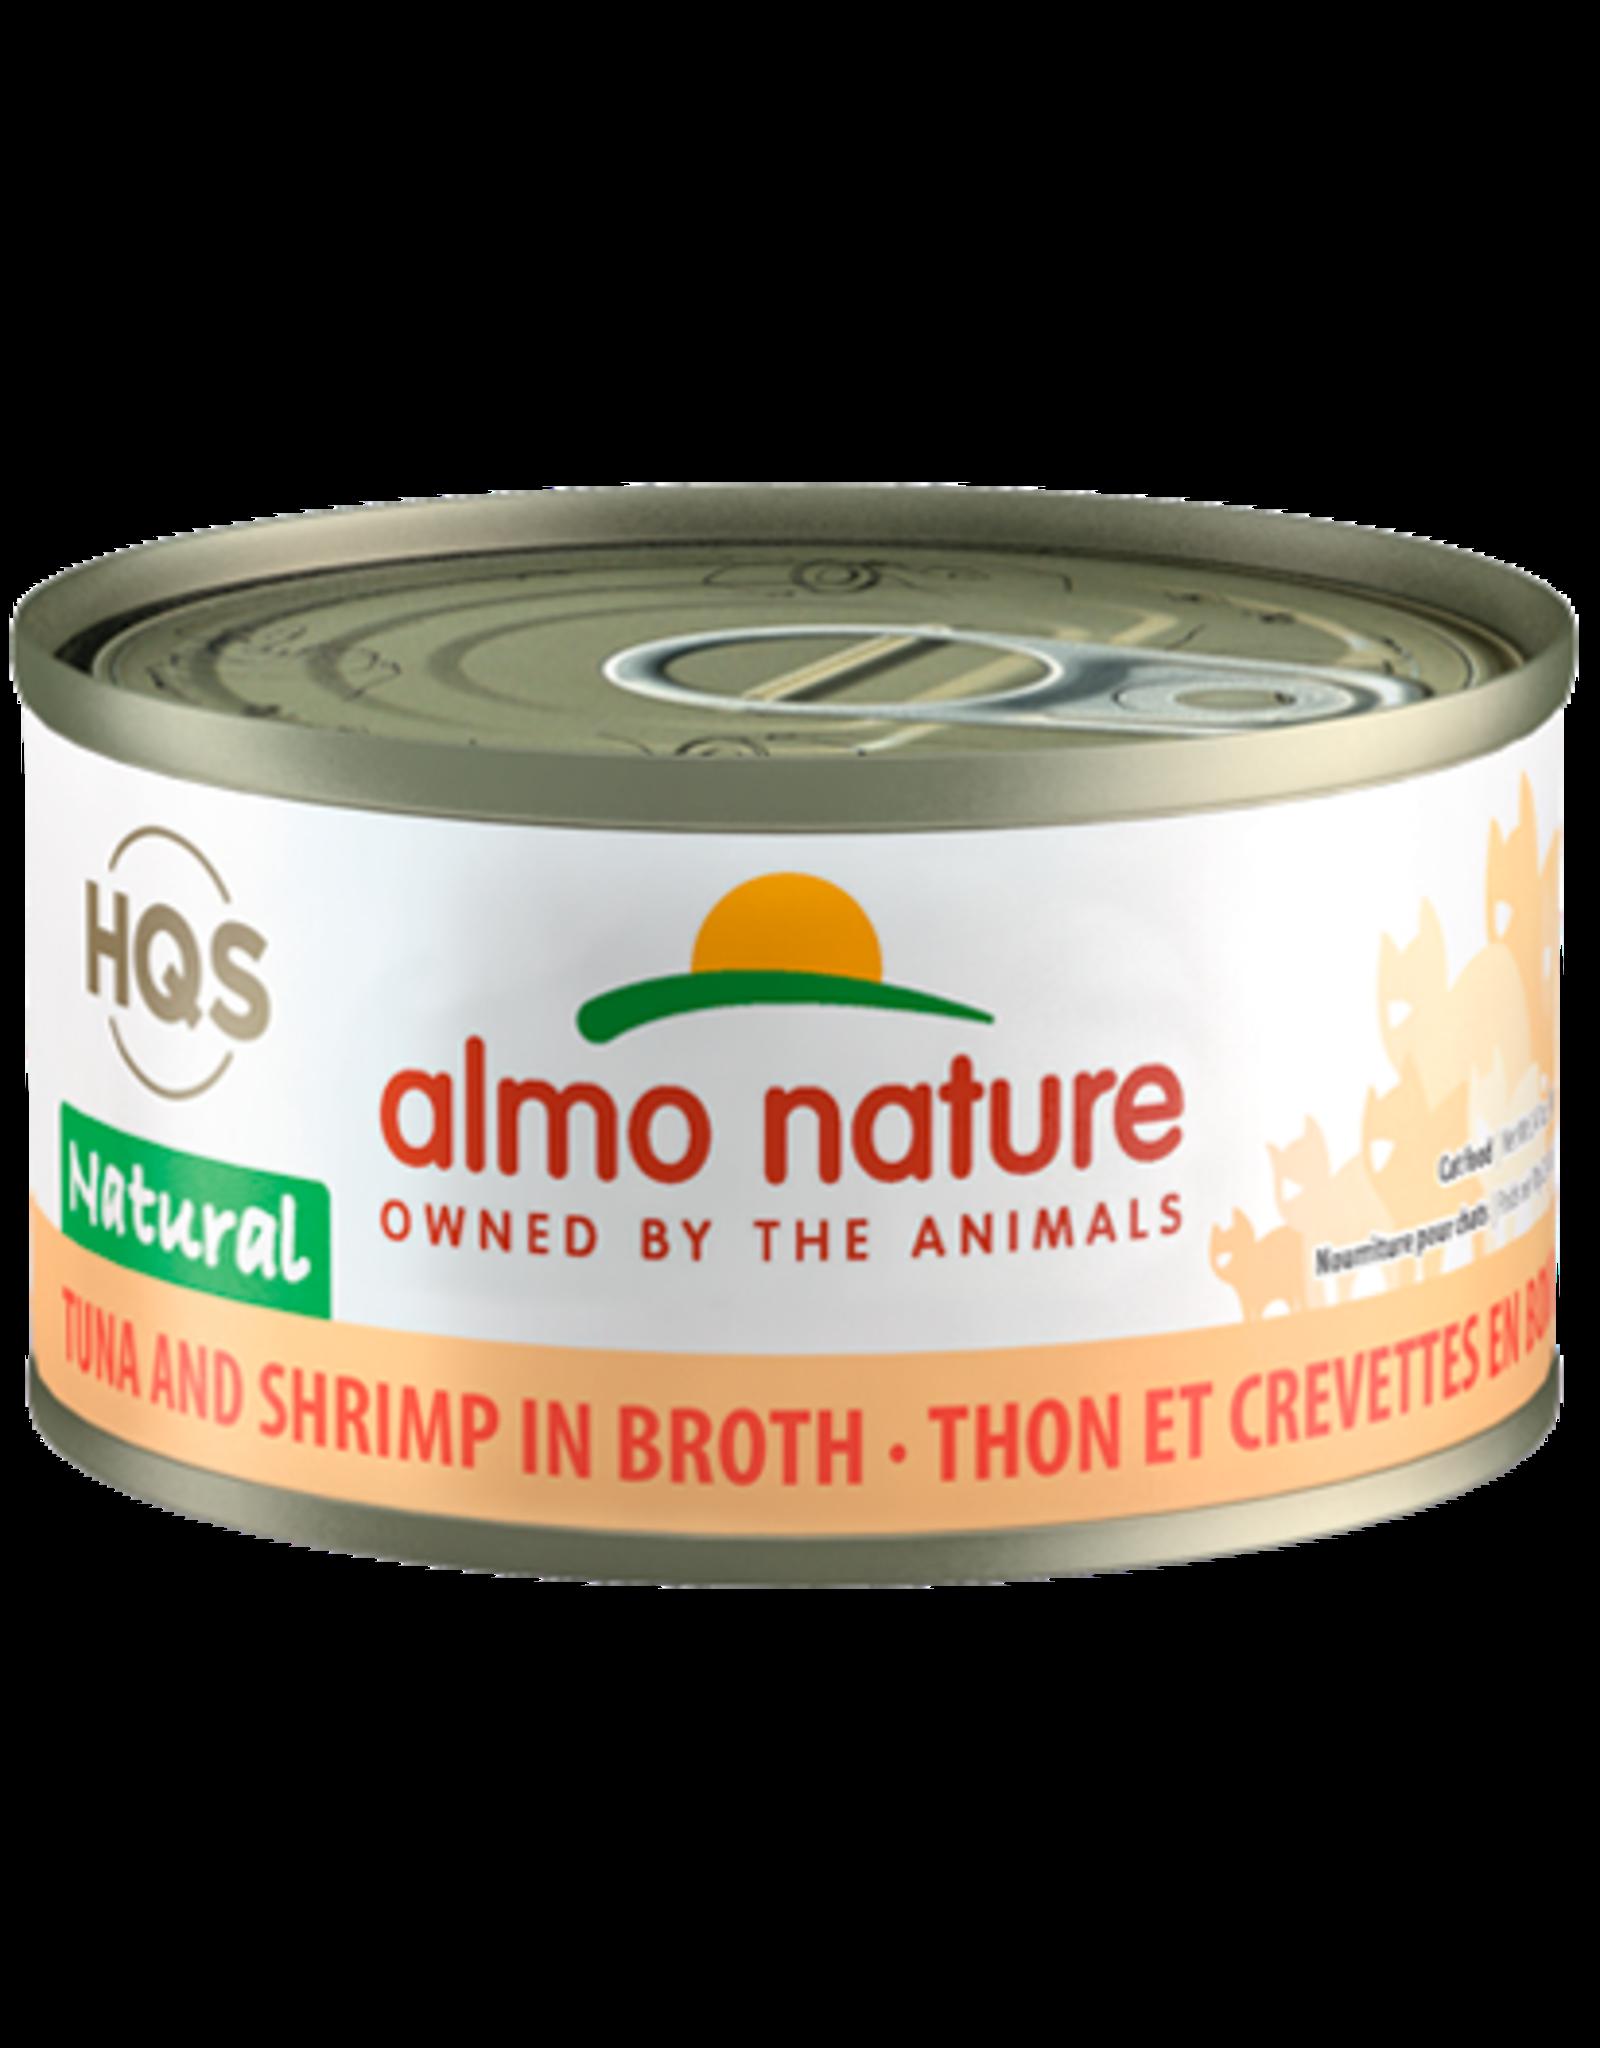 Almo Nature ALMO NATURE CAT HQS NATURAL TUNA AND SHRIMP IN BROTH